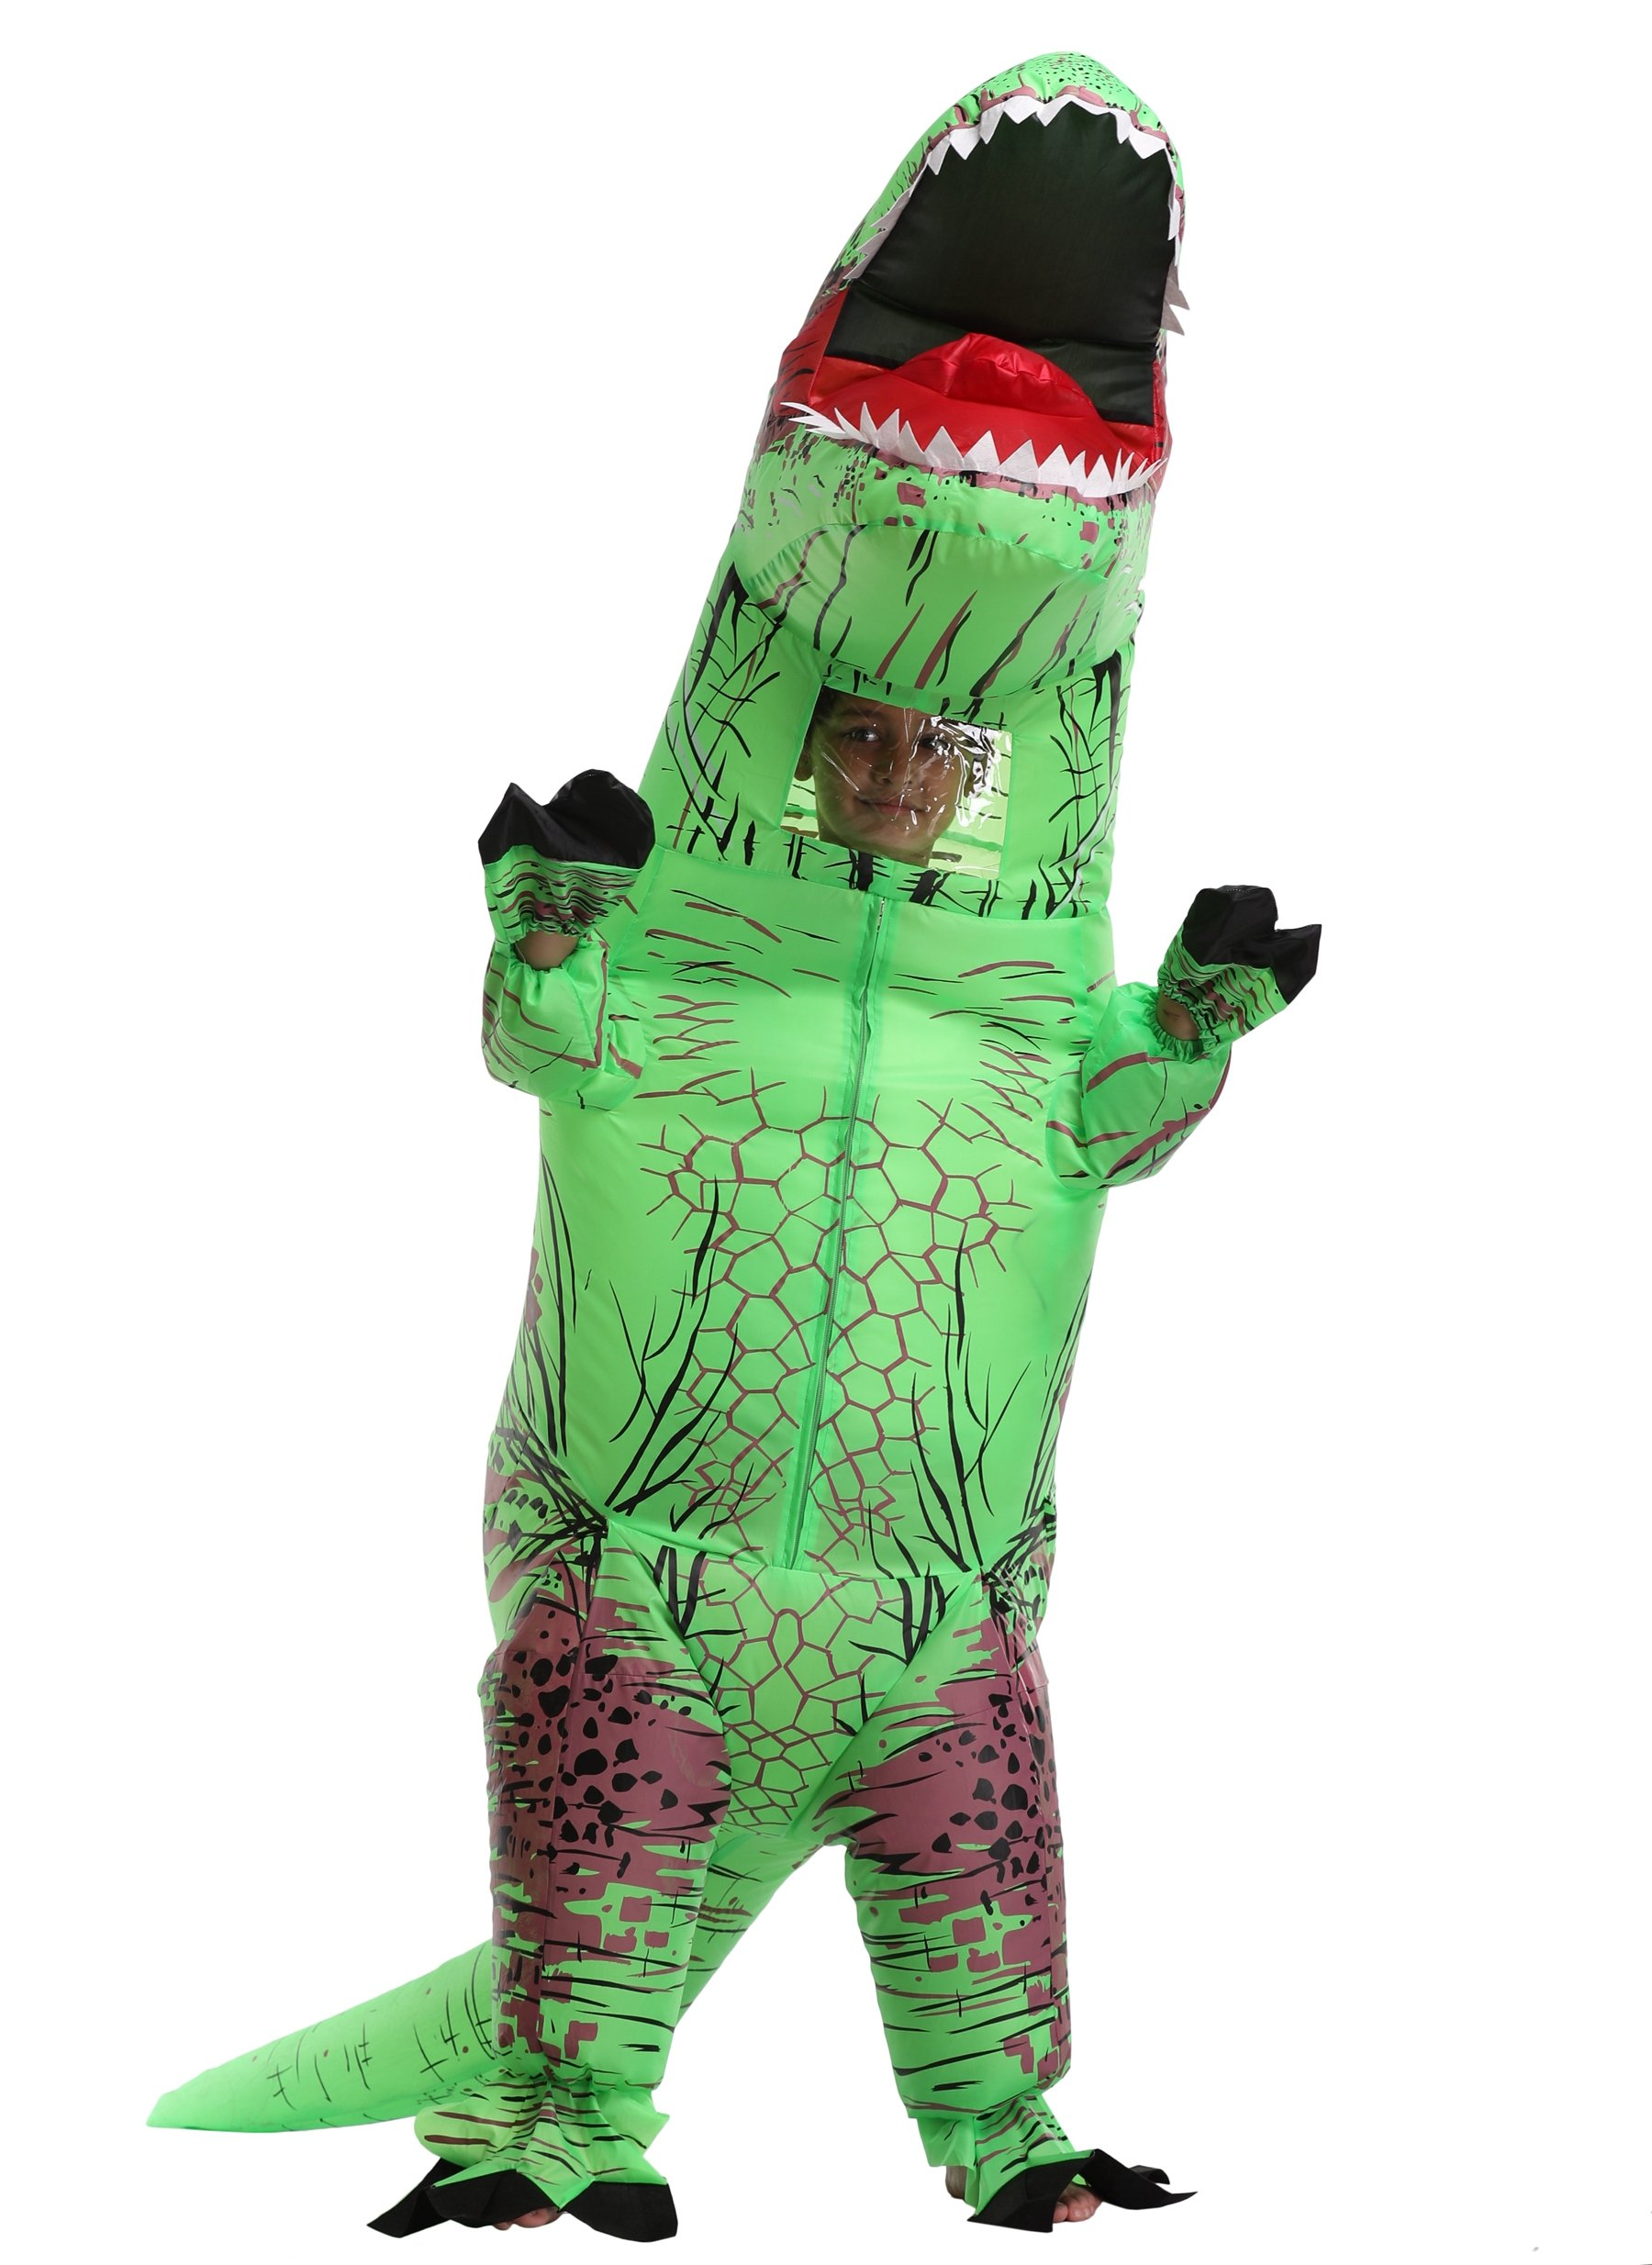 Unisex Kids Christmas Costume Jurassic T-Rex Inflatable Costume, child, Green